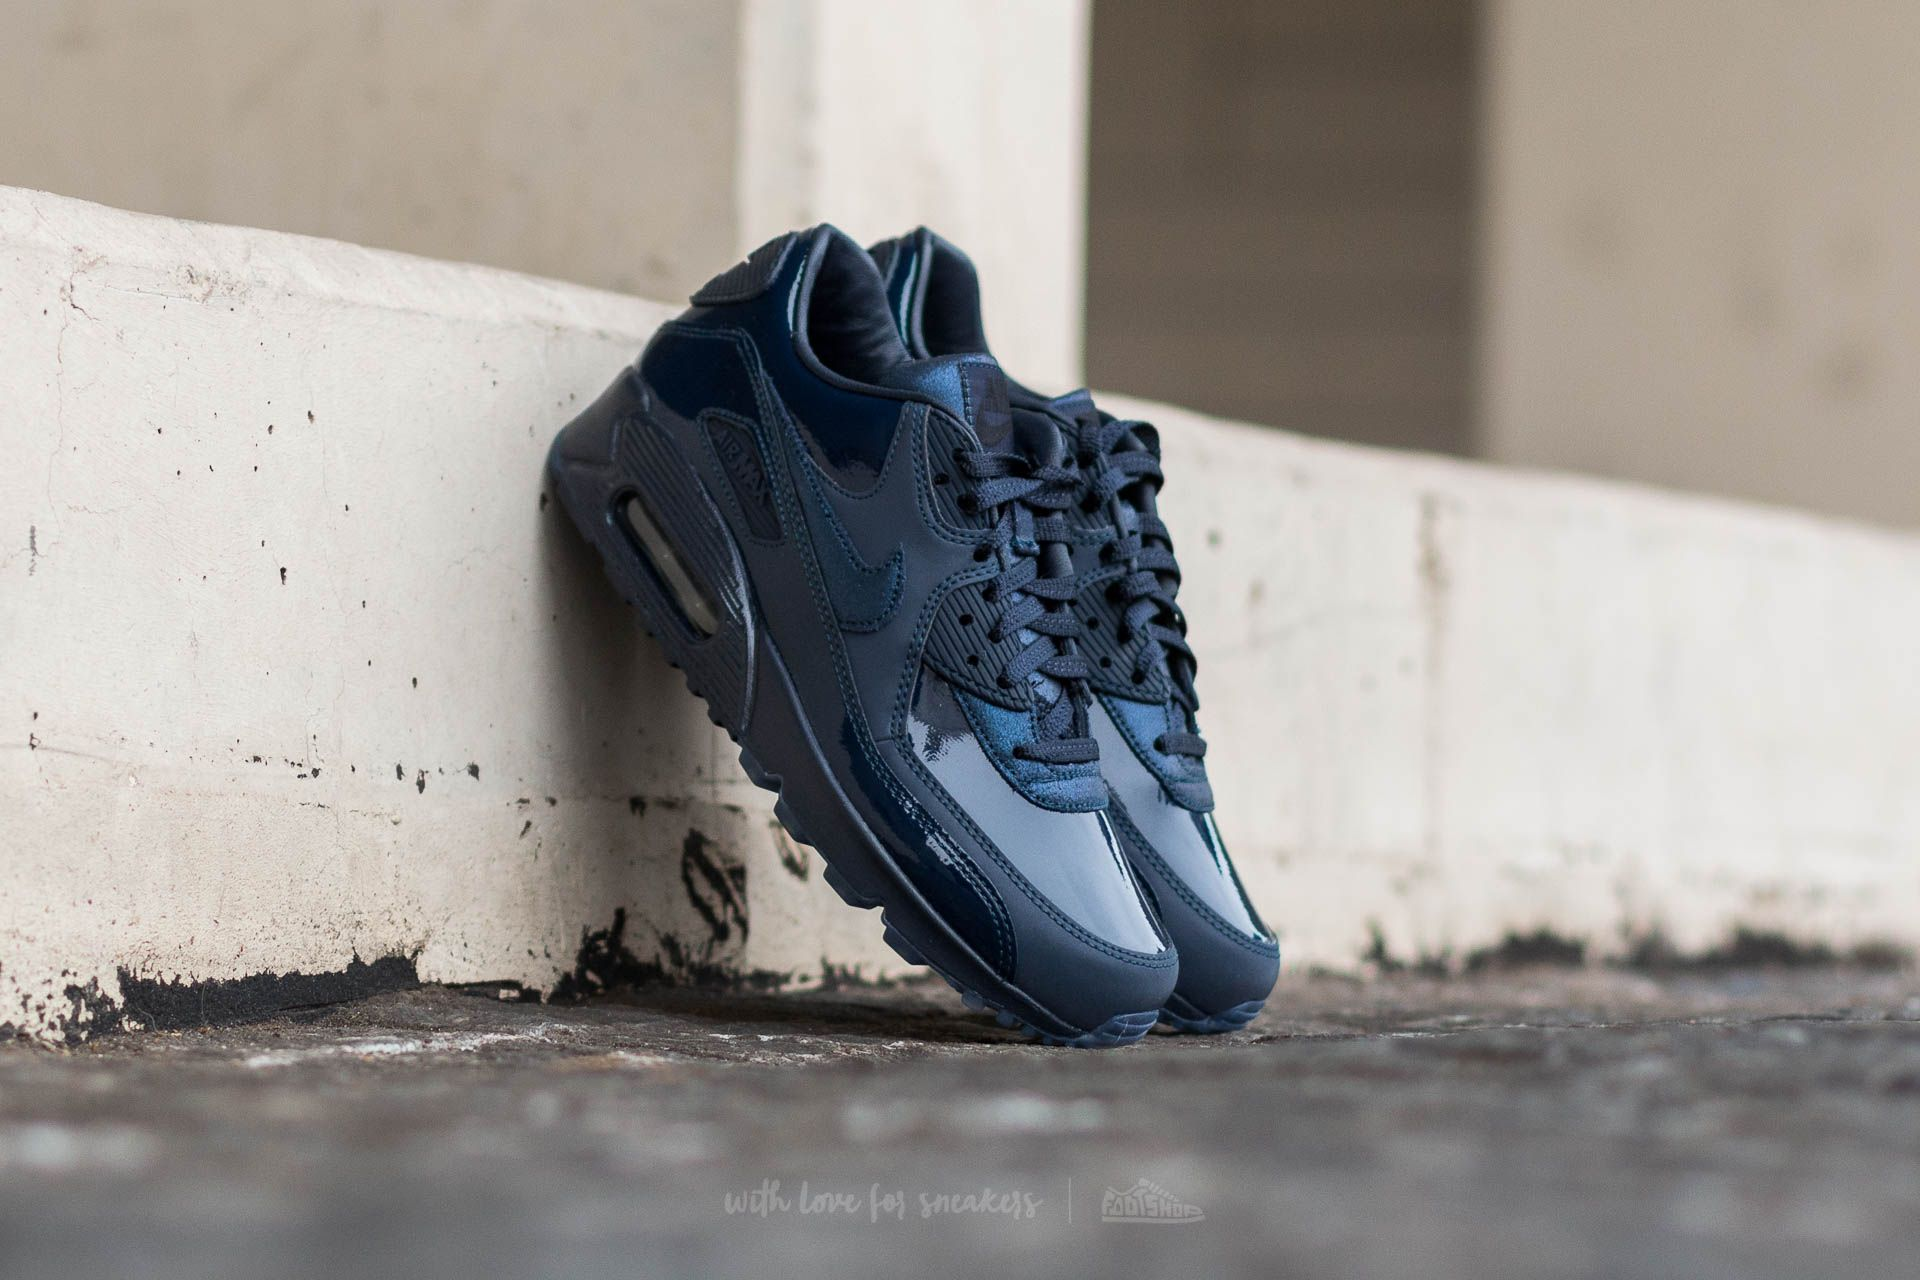 online store 2a0ce e29b5 Nike Wmns Air Max 90 Pedro Lourenco Obsidian Obsidian